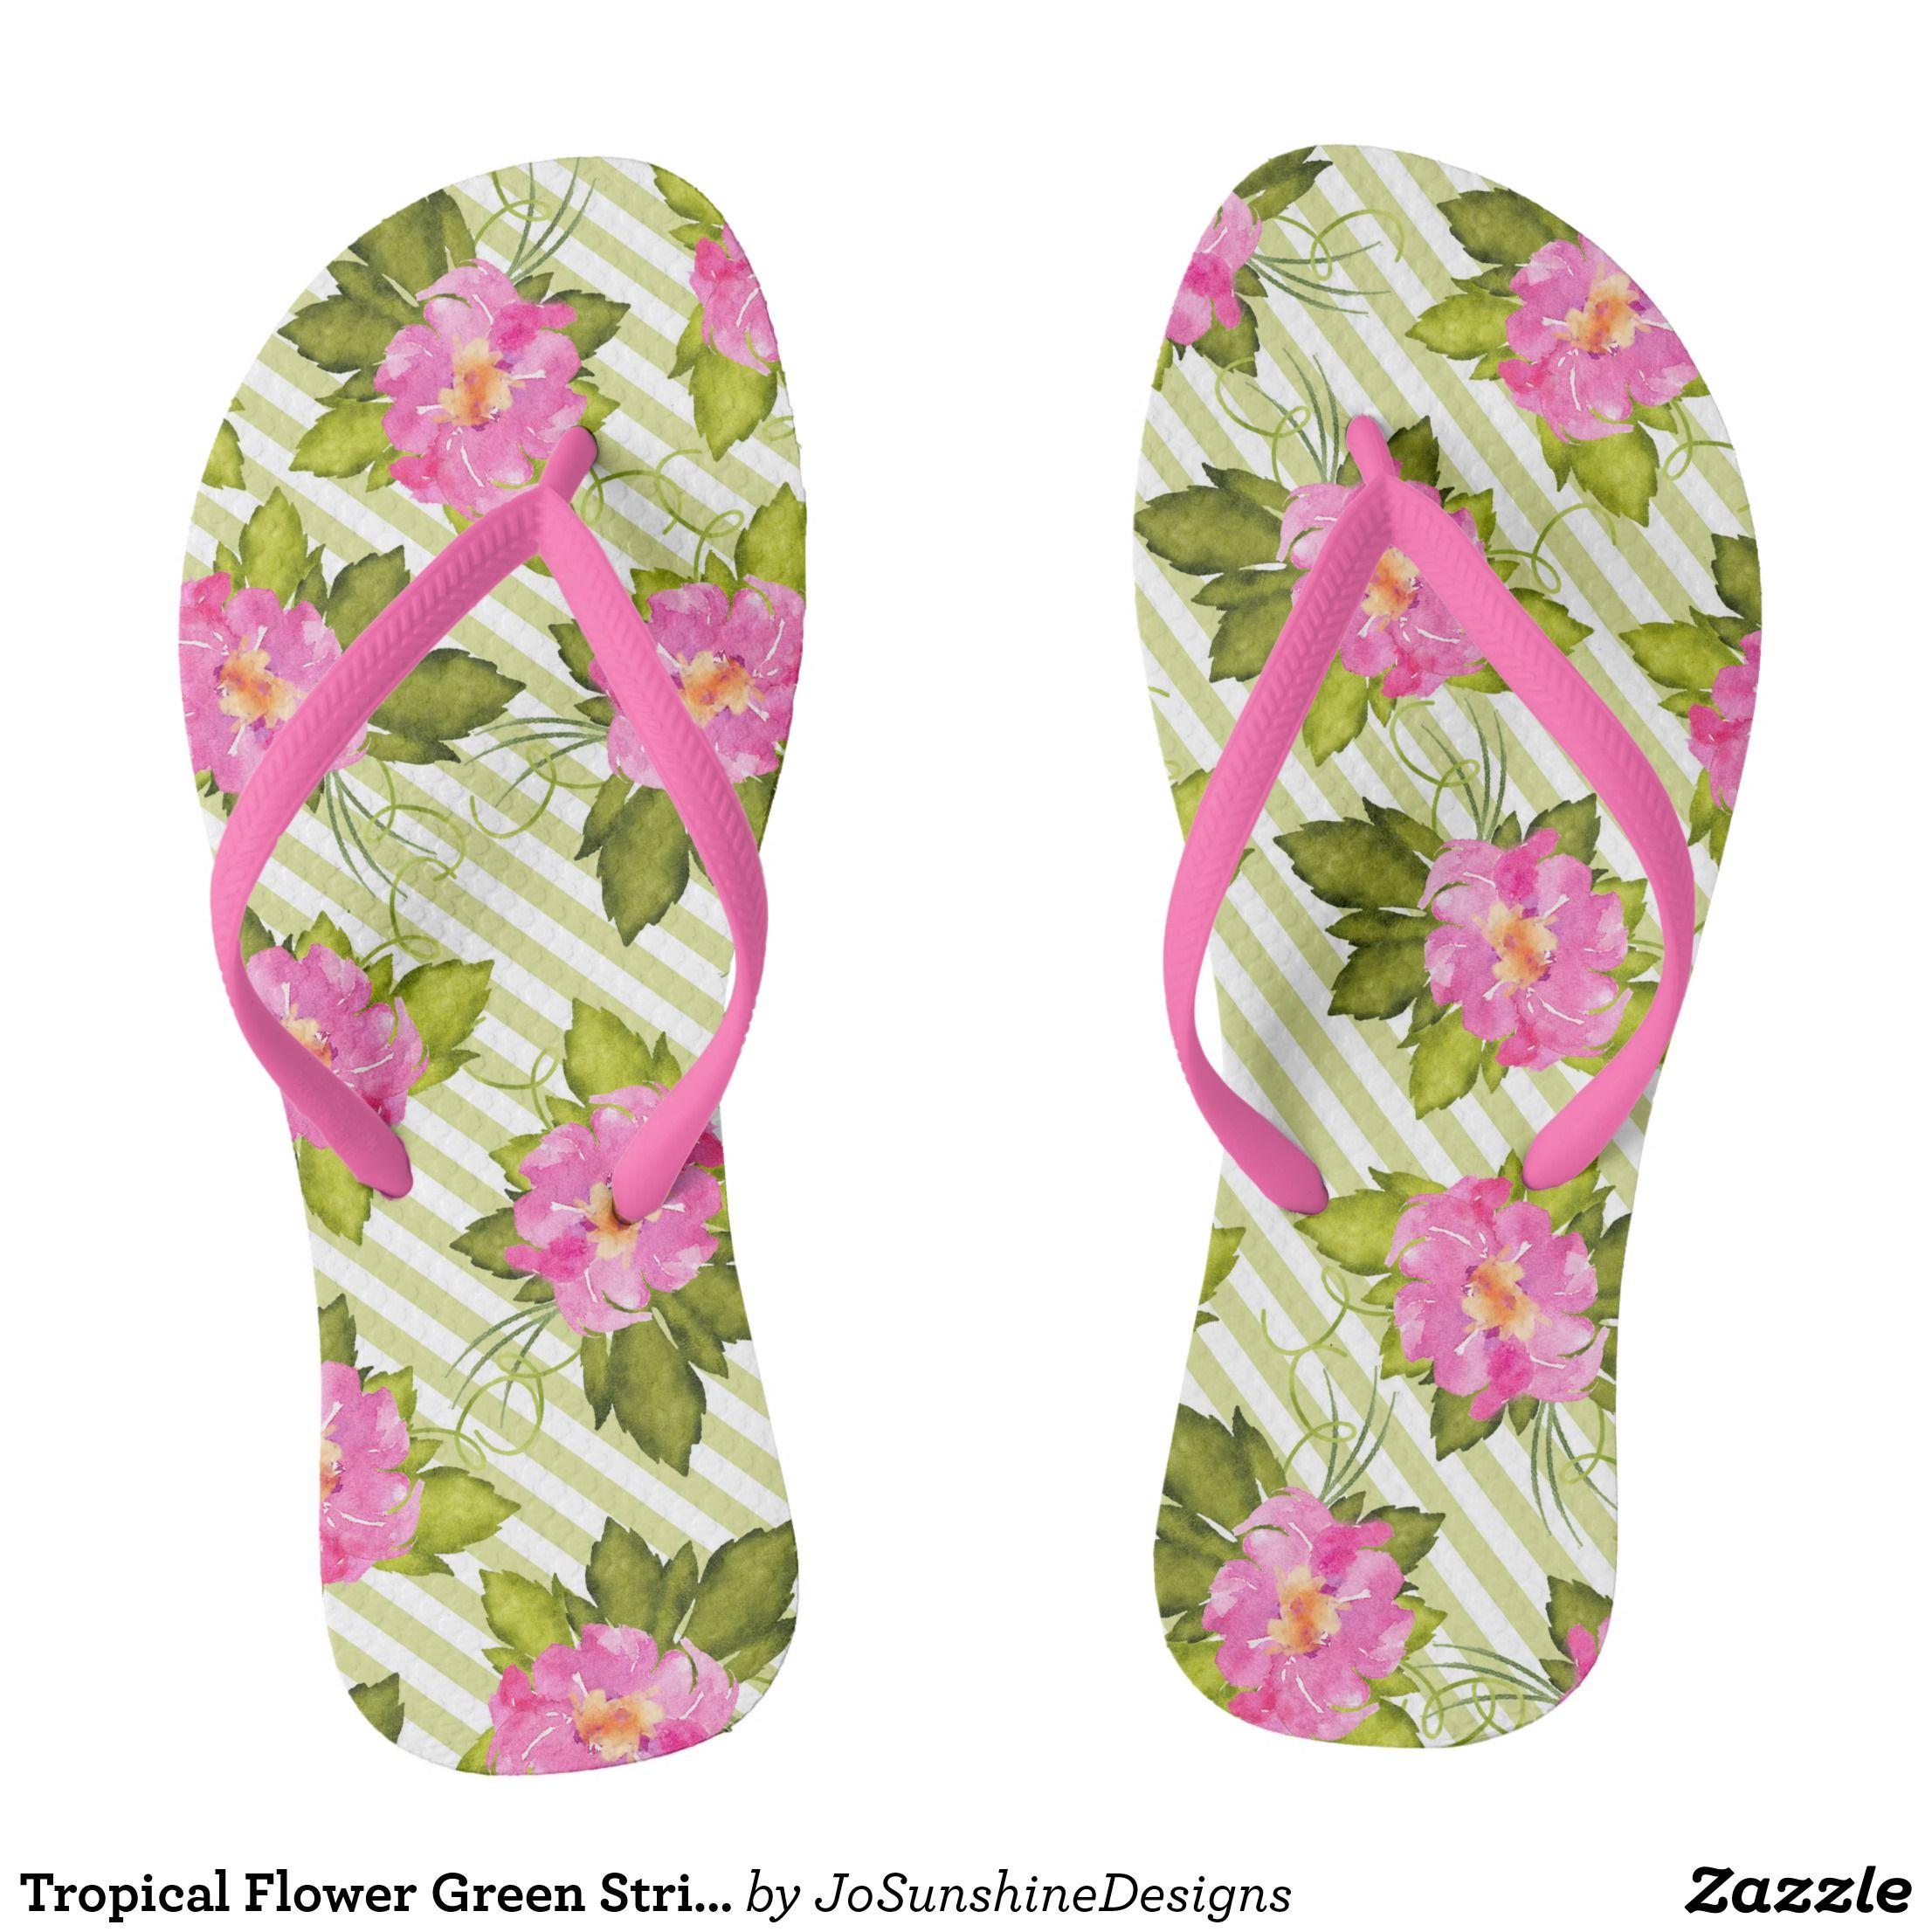 Tropical Flower Green Stripes Flip Flops Durable Style Hawaiian Beach Sandals By Talented Fashion Graphic Designers Flipflops Hawaii